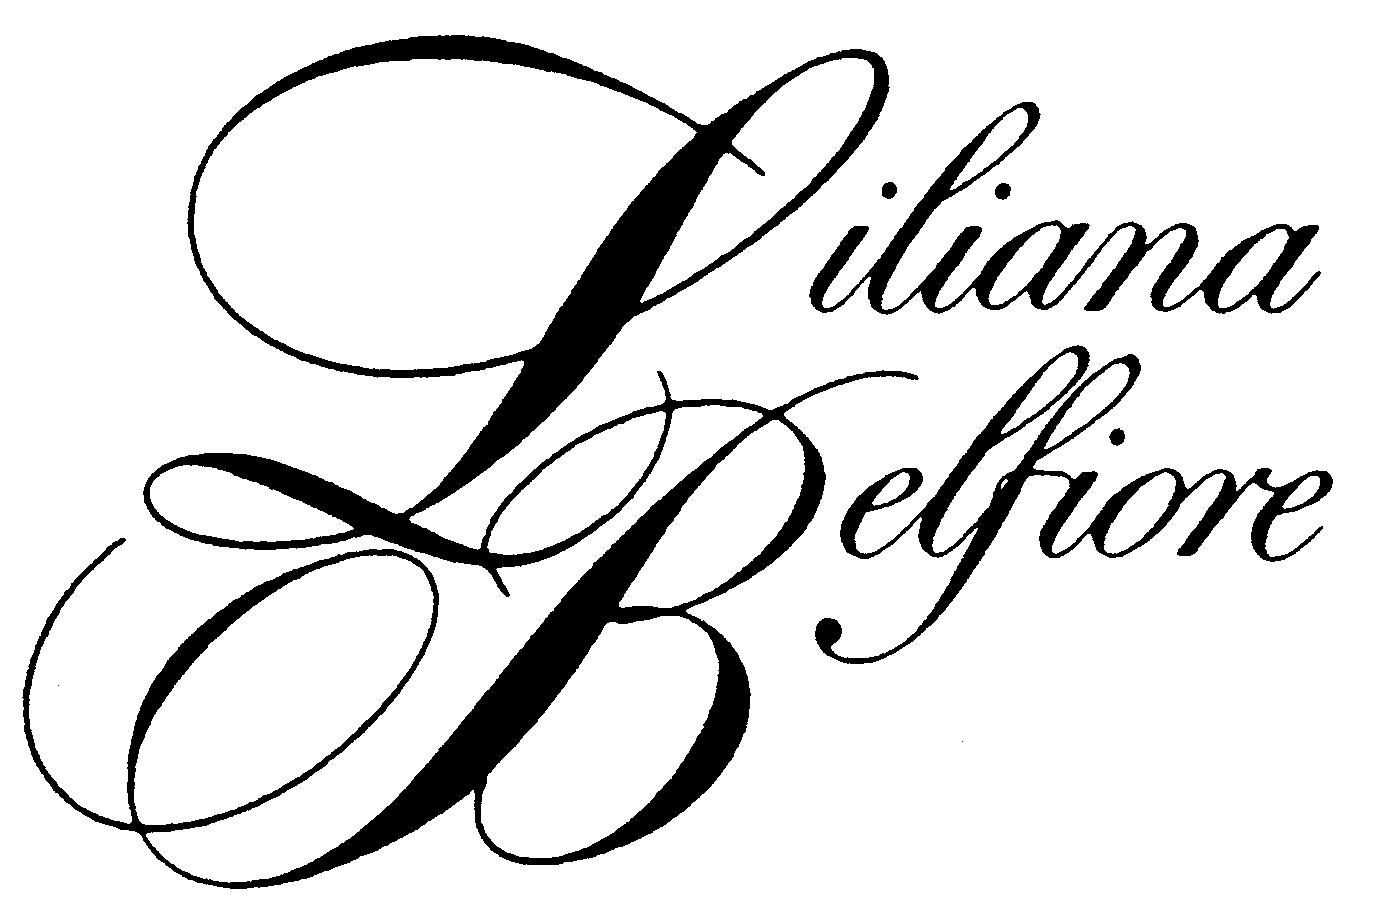 Liliana Belfiore